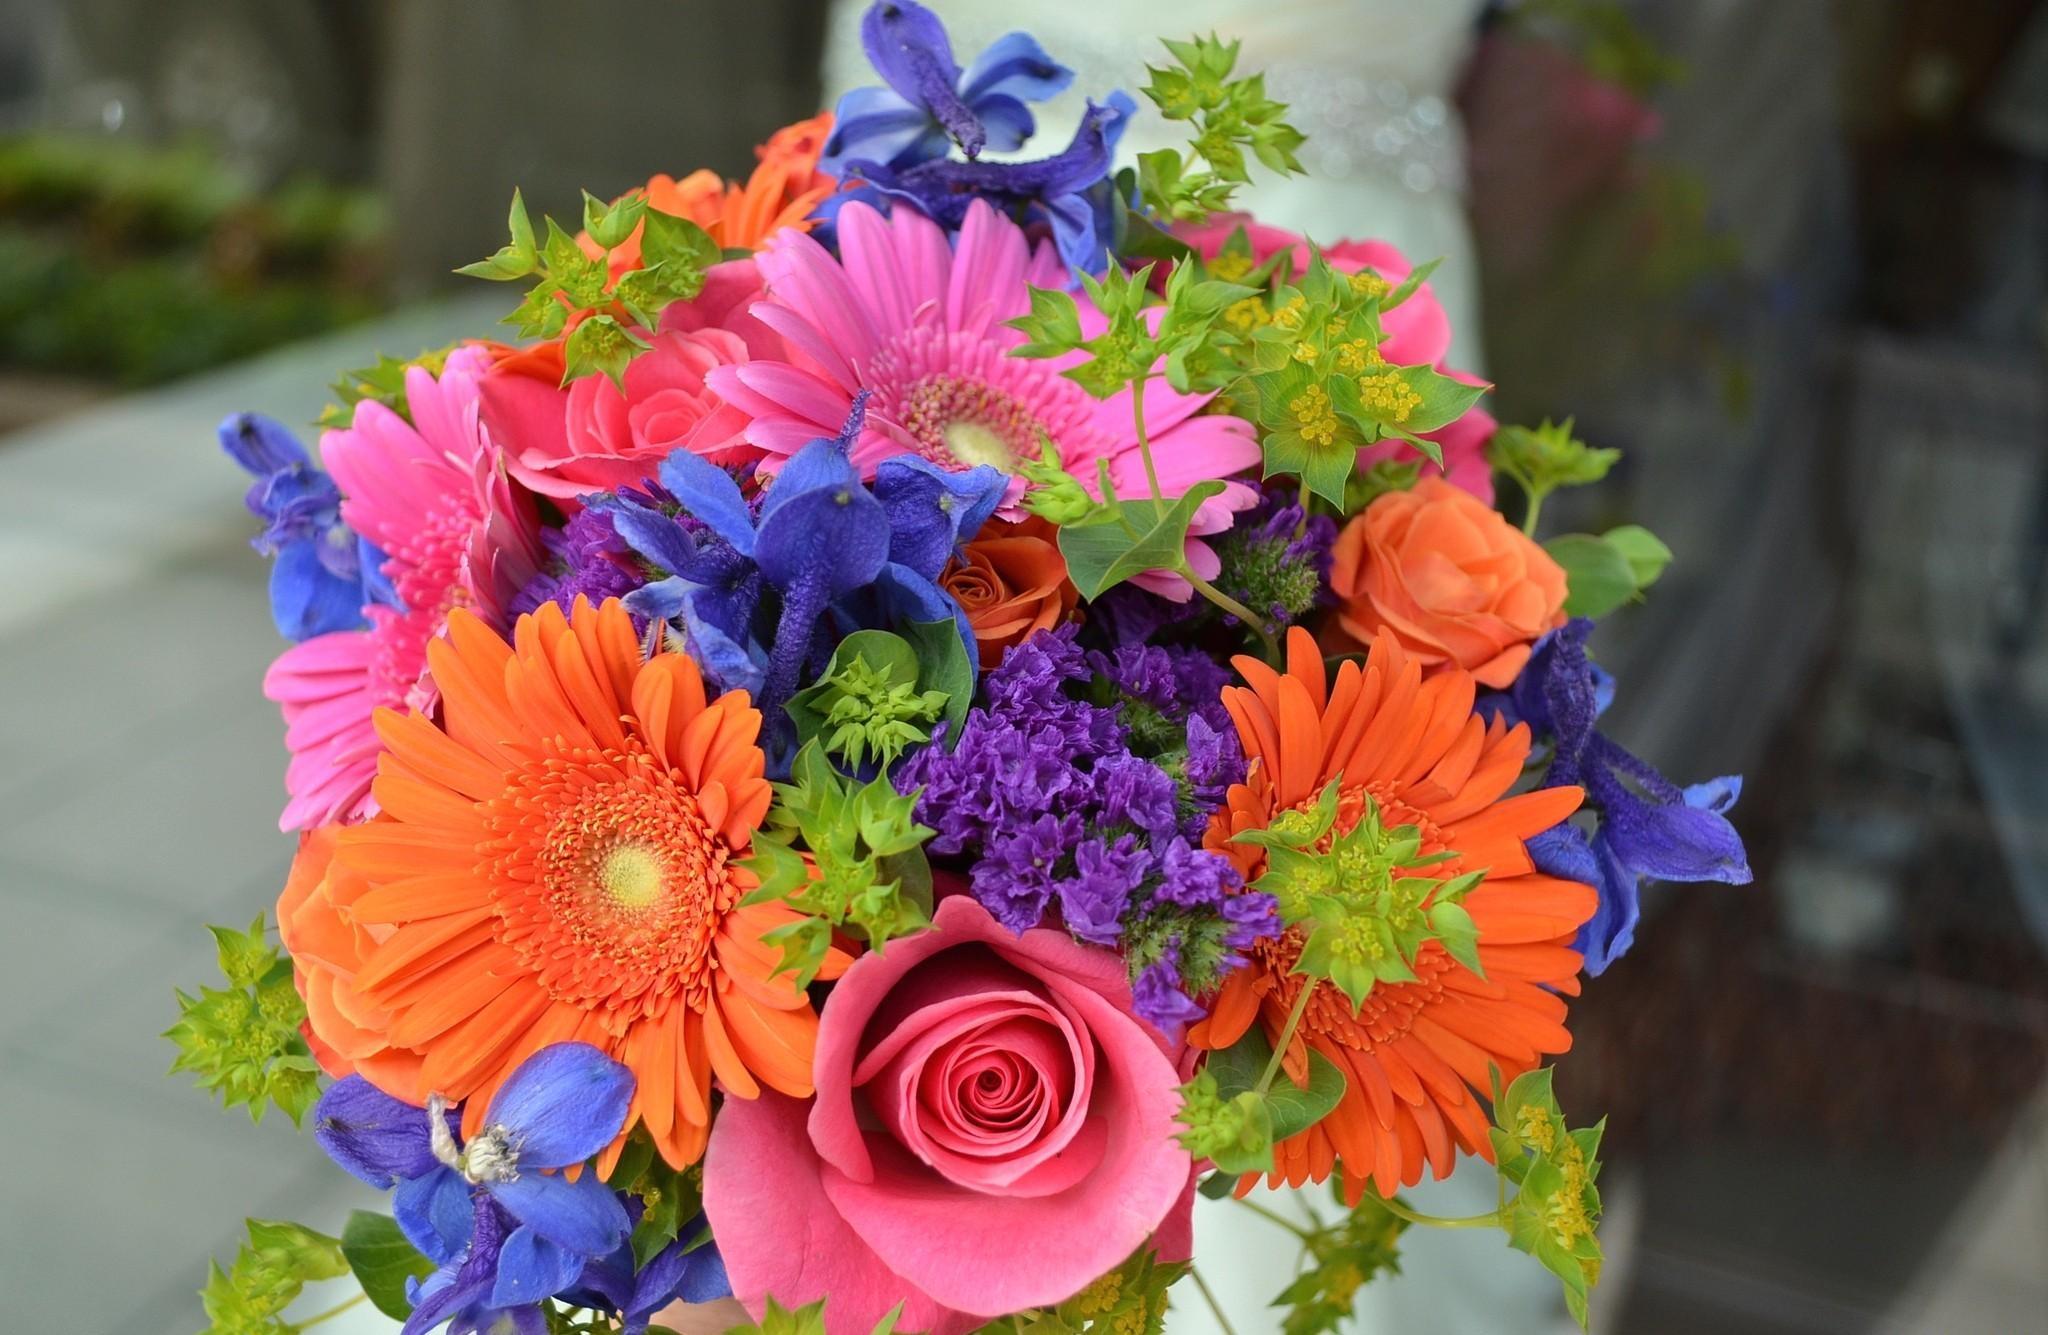 Wallpaper : roses, gerbera, flowers, bouquet, colorful, combination ...